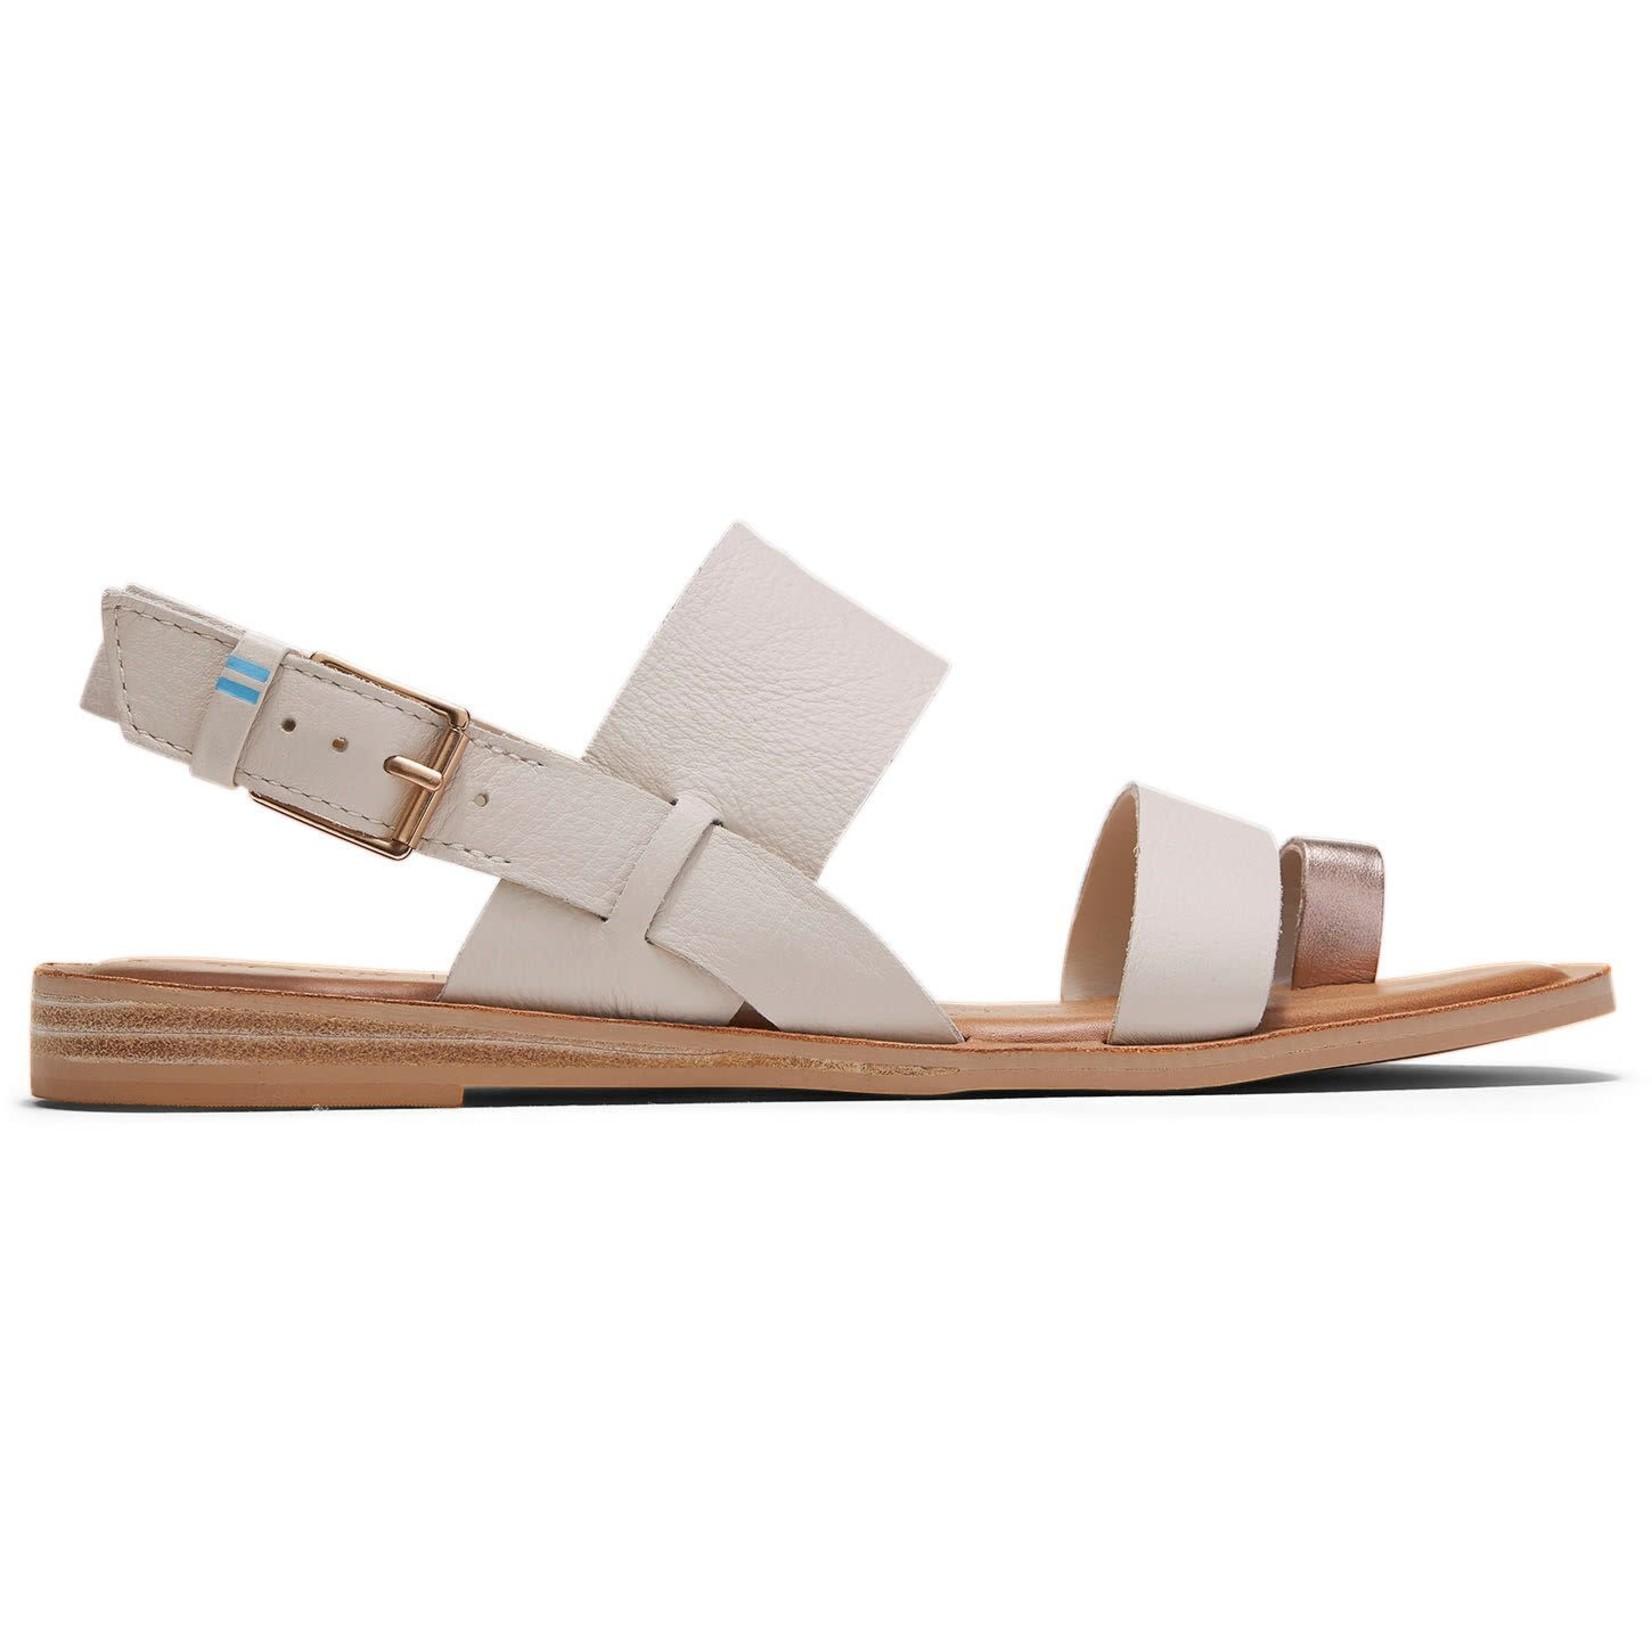 Toms Toms Sandals, Freya, Ladies